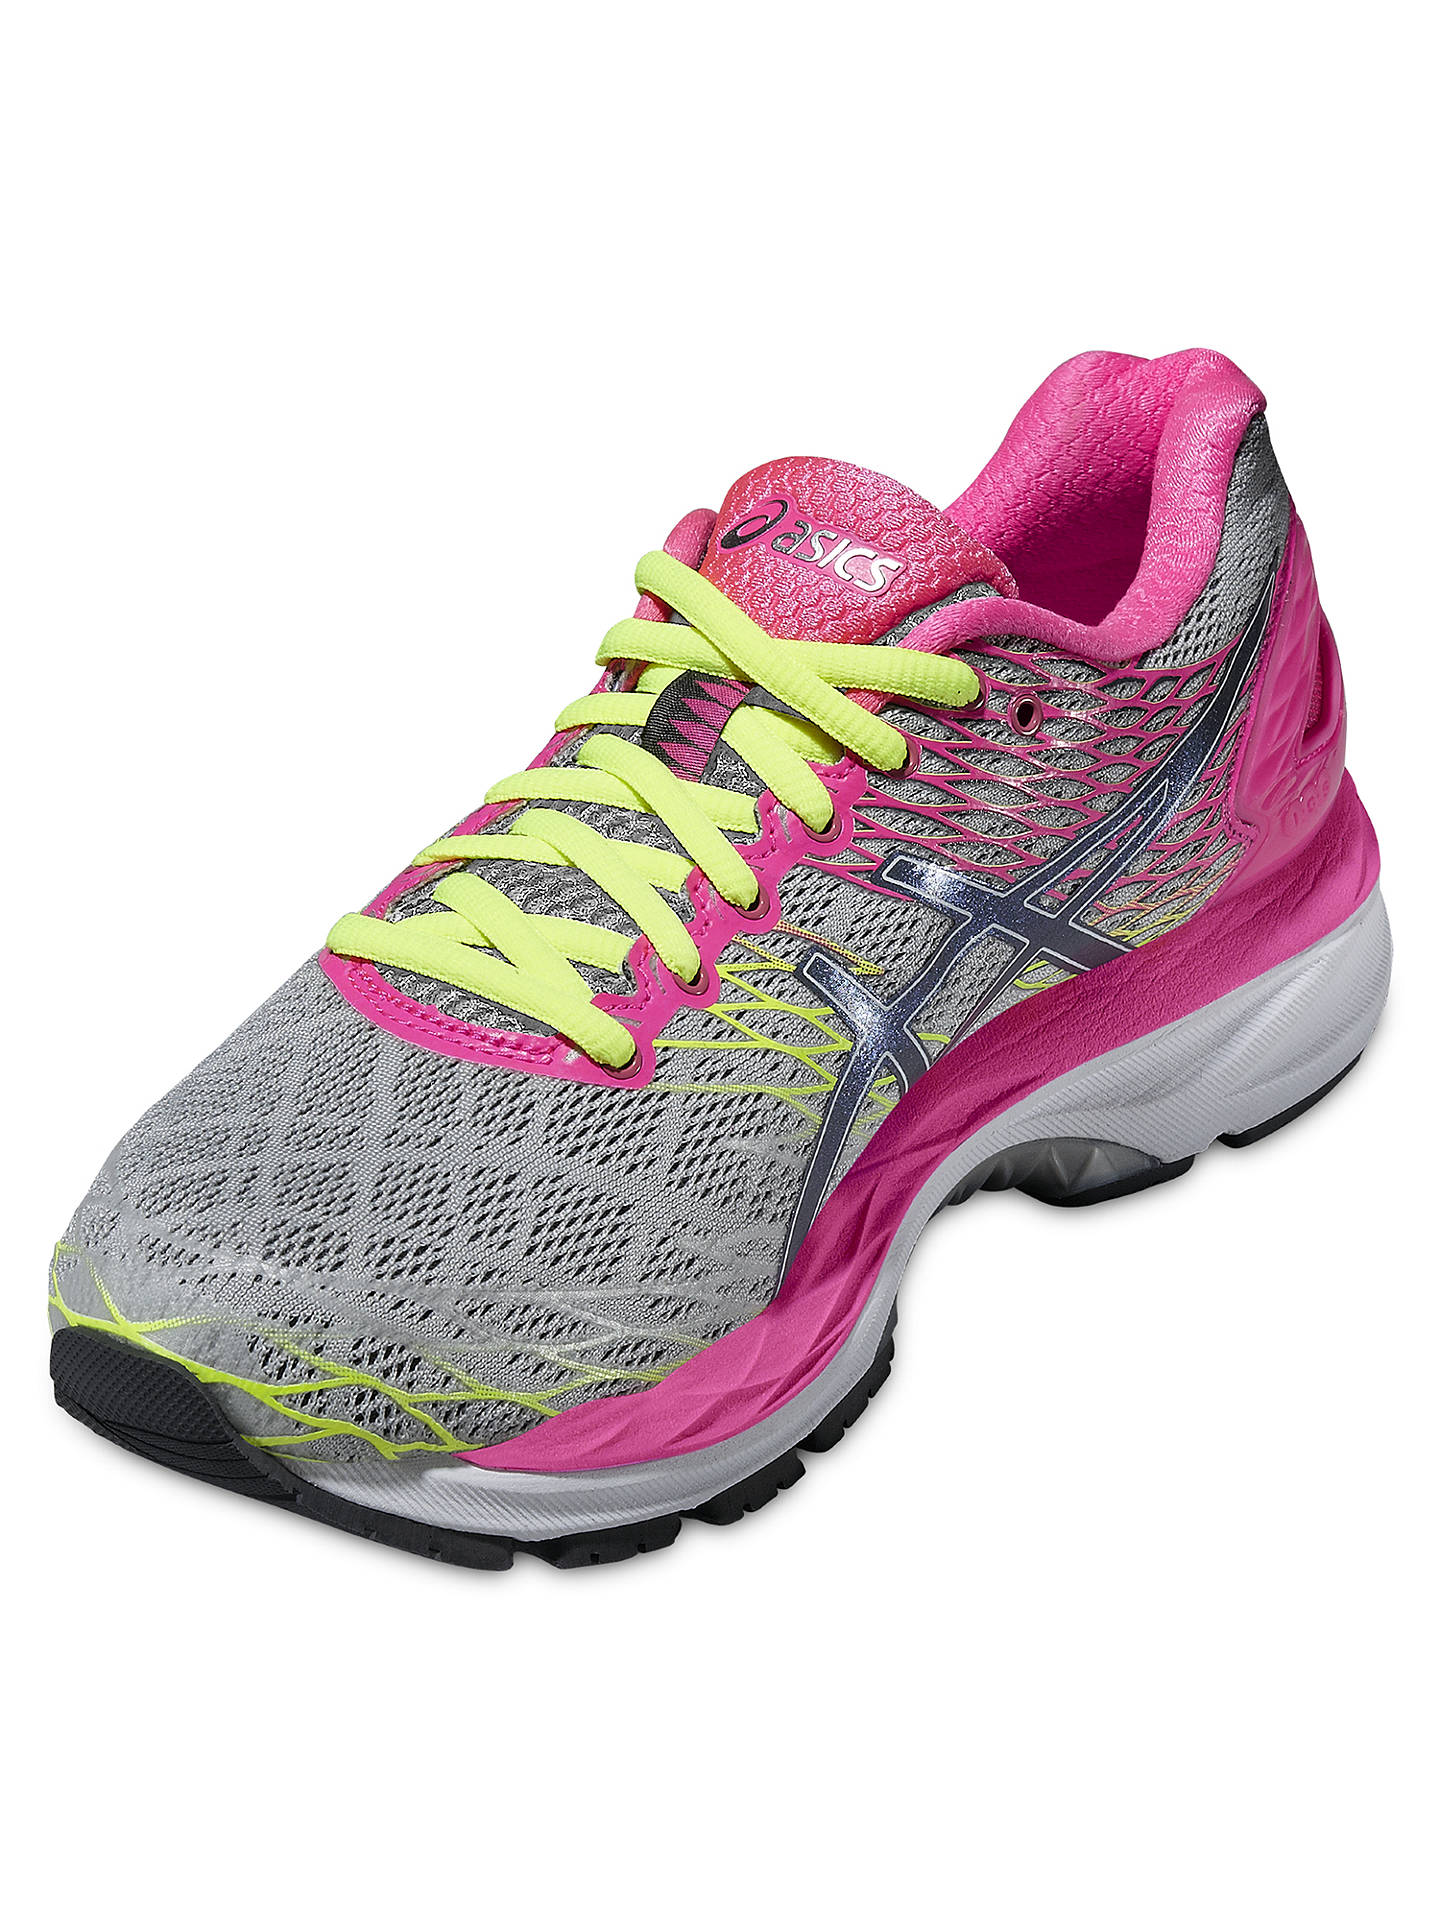 19d1eb05c567 Asics Gel-Nimbus 18 Women s Running Shoes at John Lewis   Partners